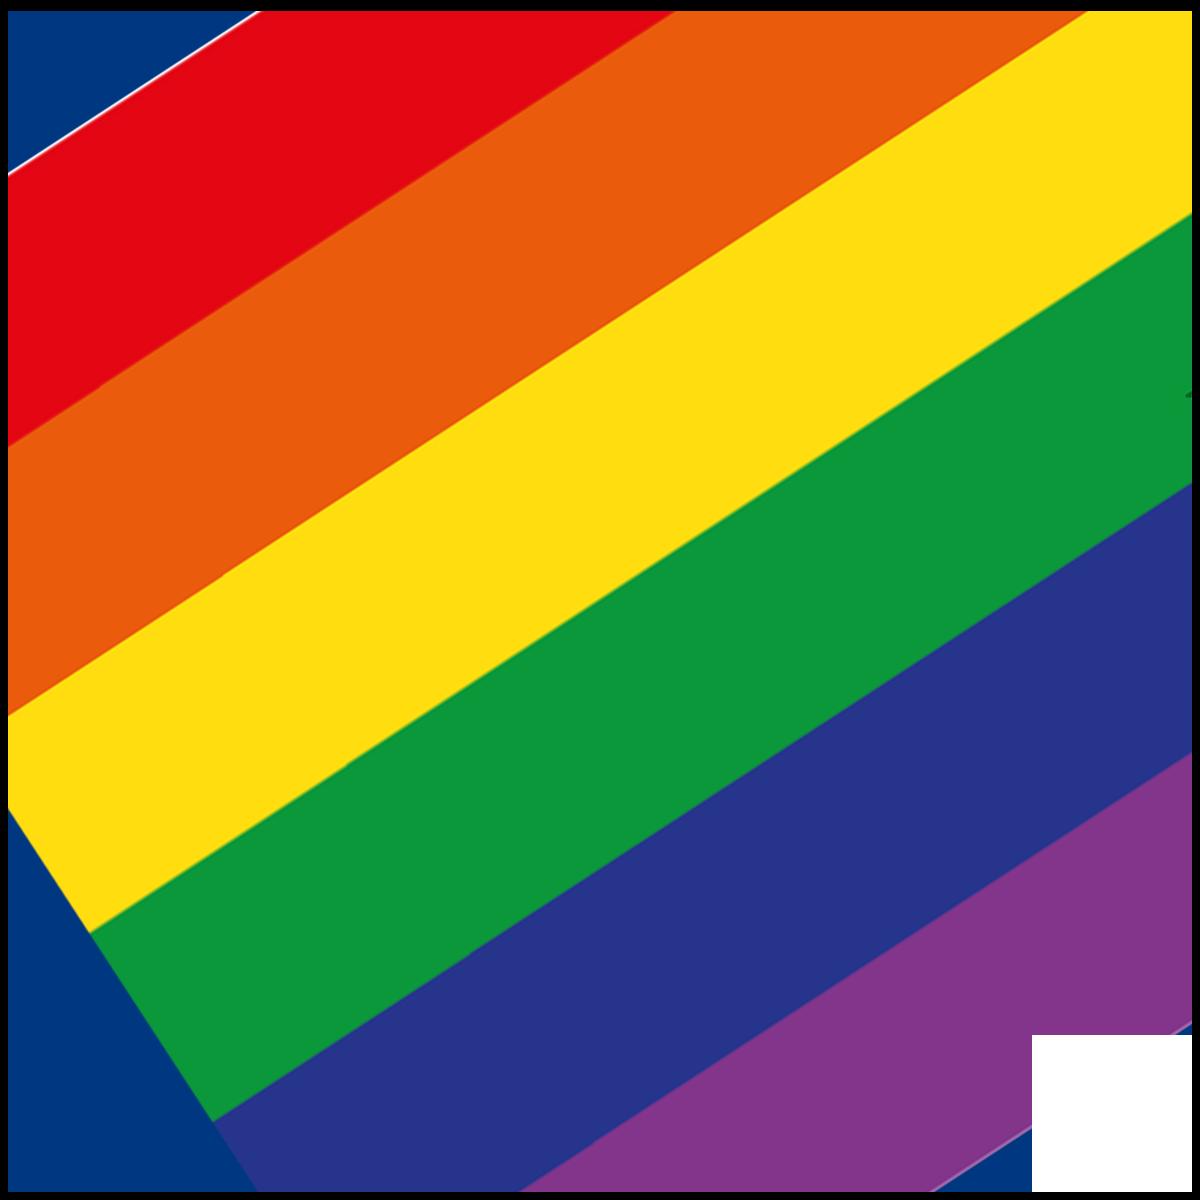 AZ_Eagle_rainbow_1